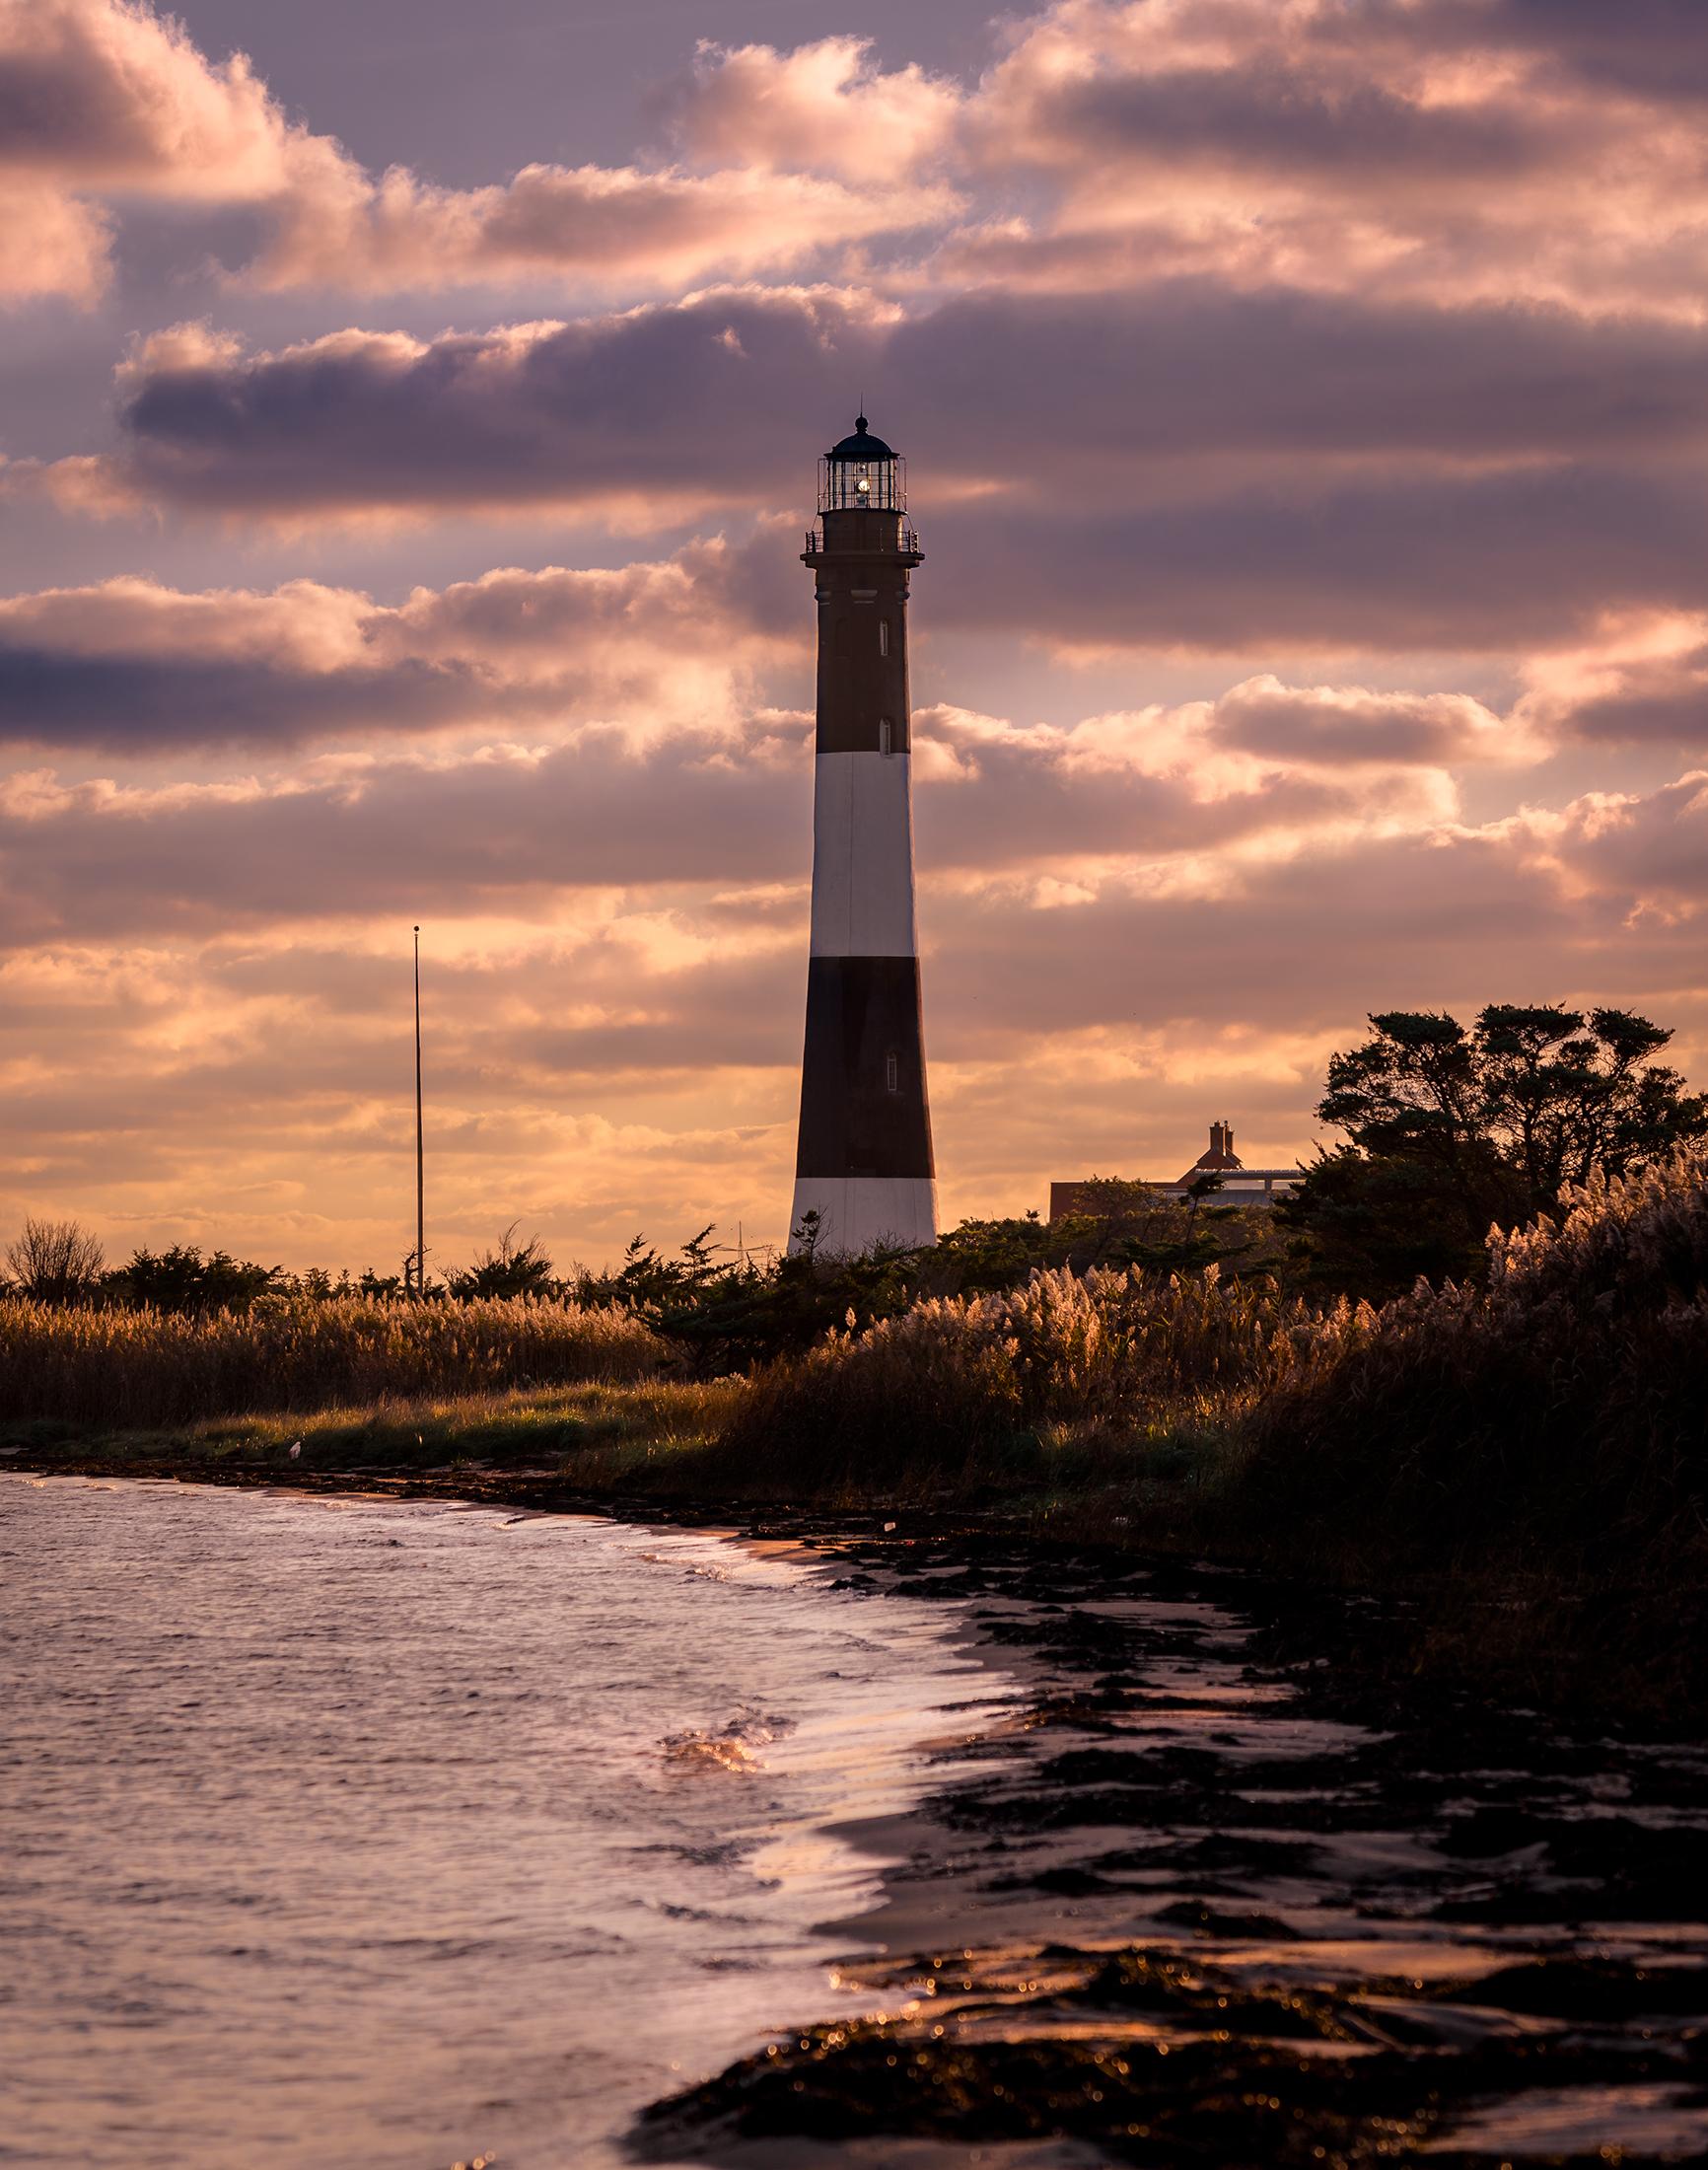 FINS_Lighthouse.jpg